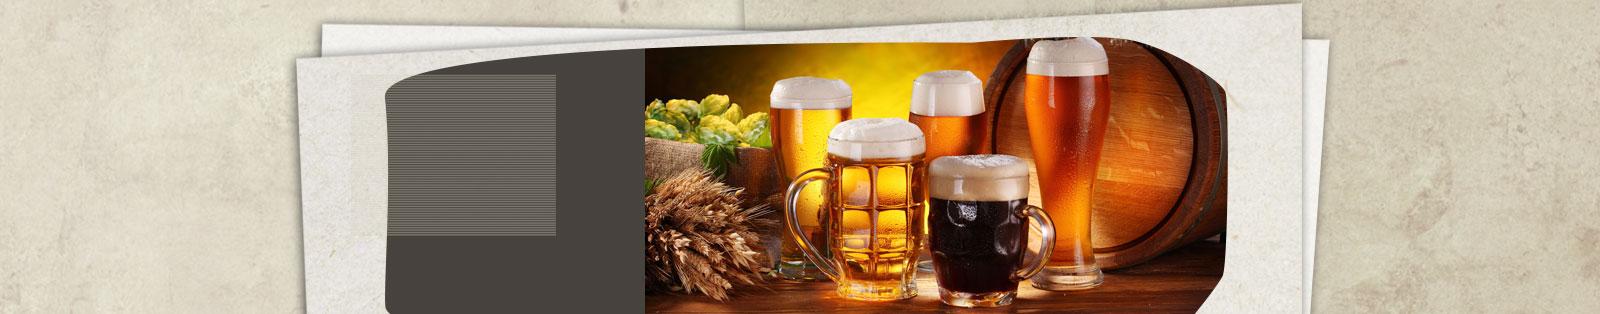 La birra del nostro pub